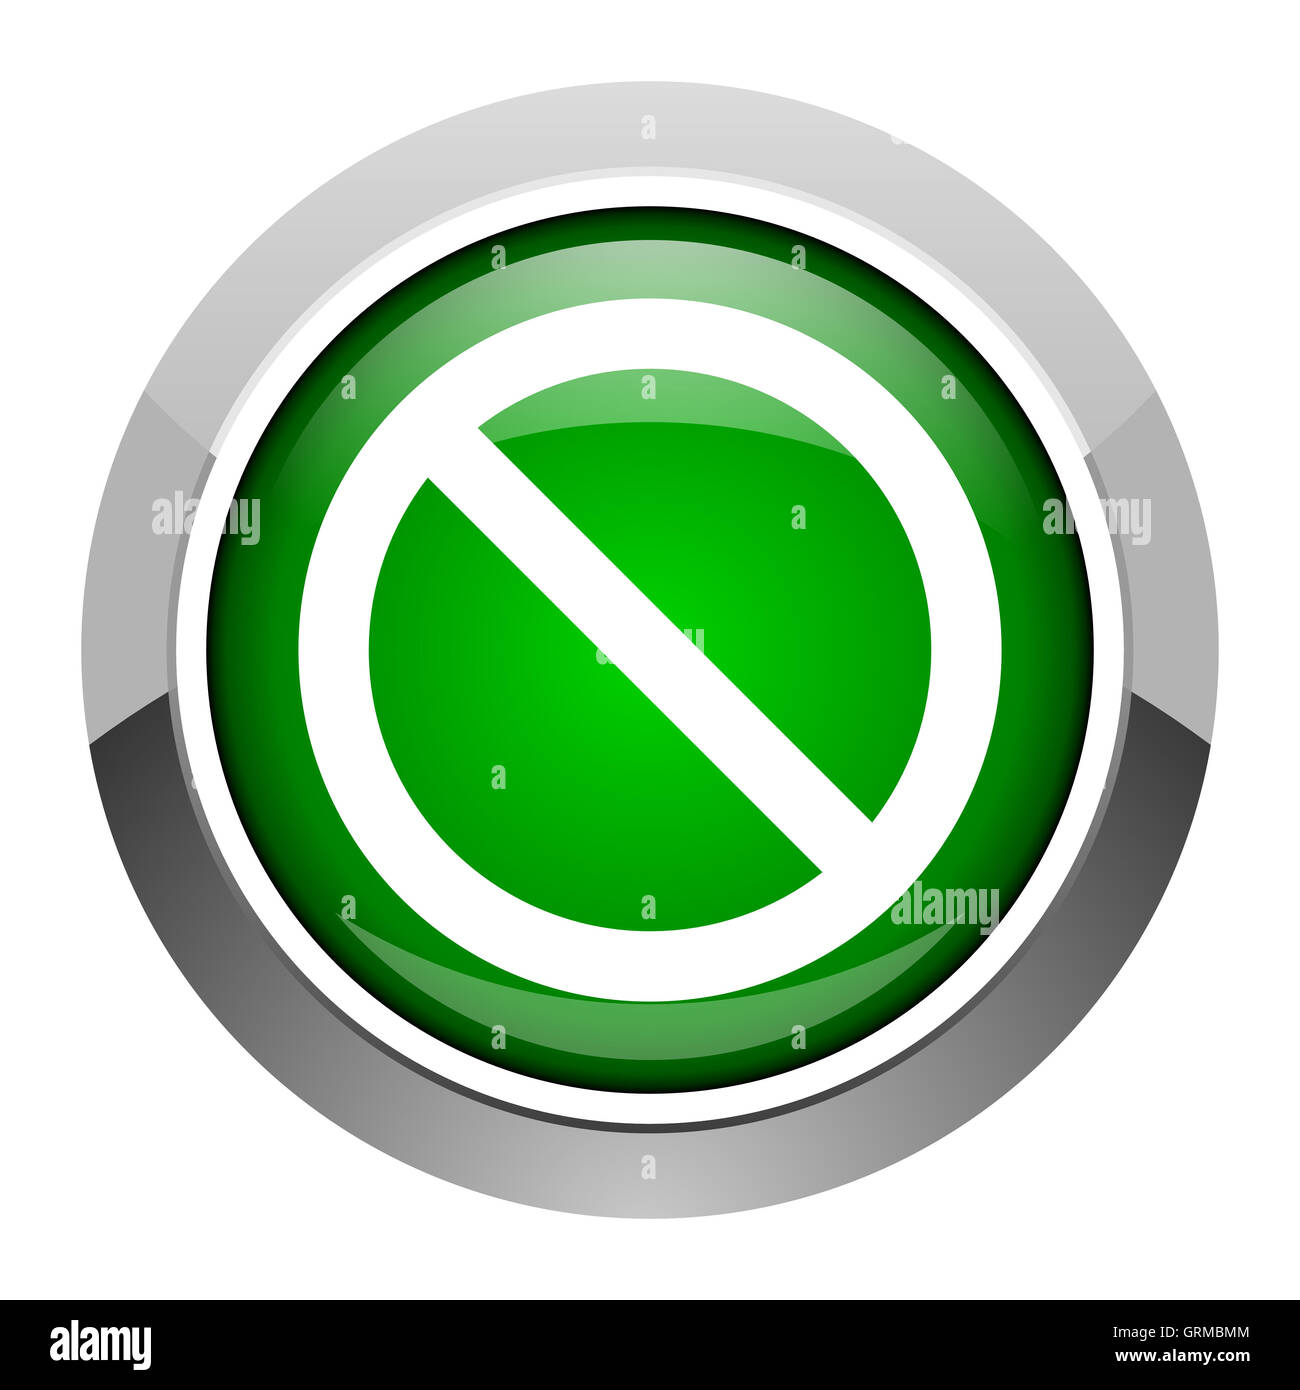 access denied icon - Stock Image